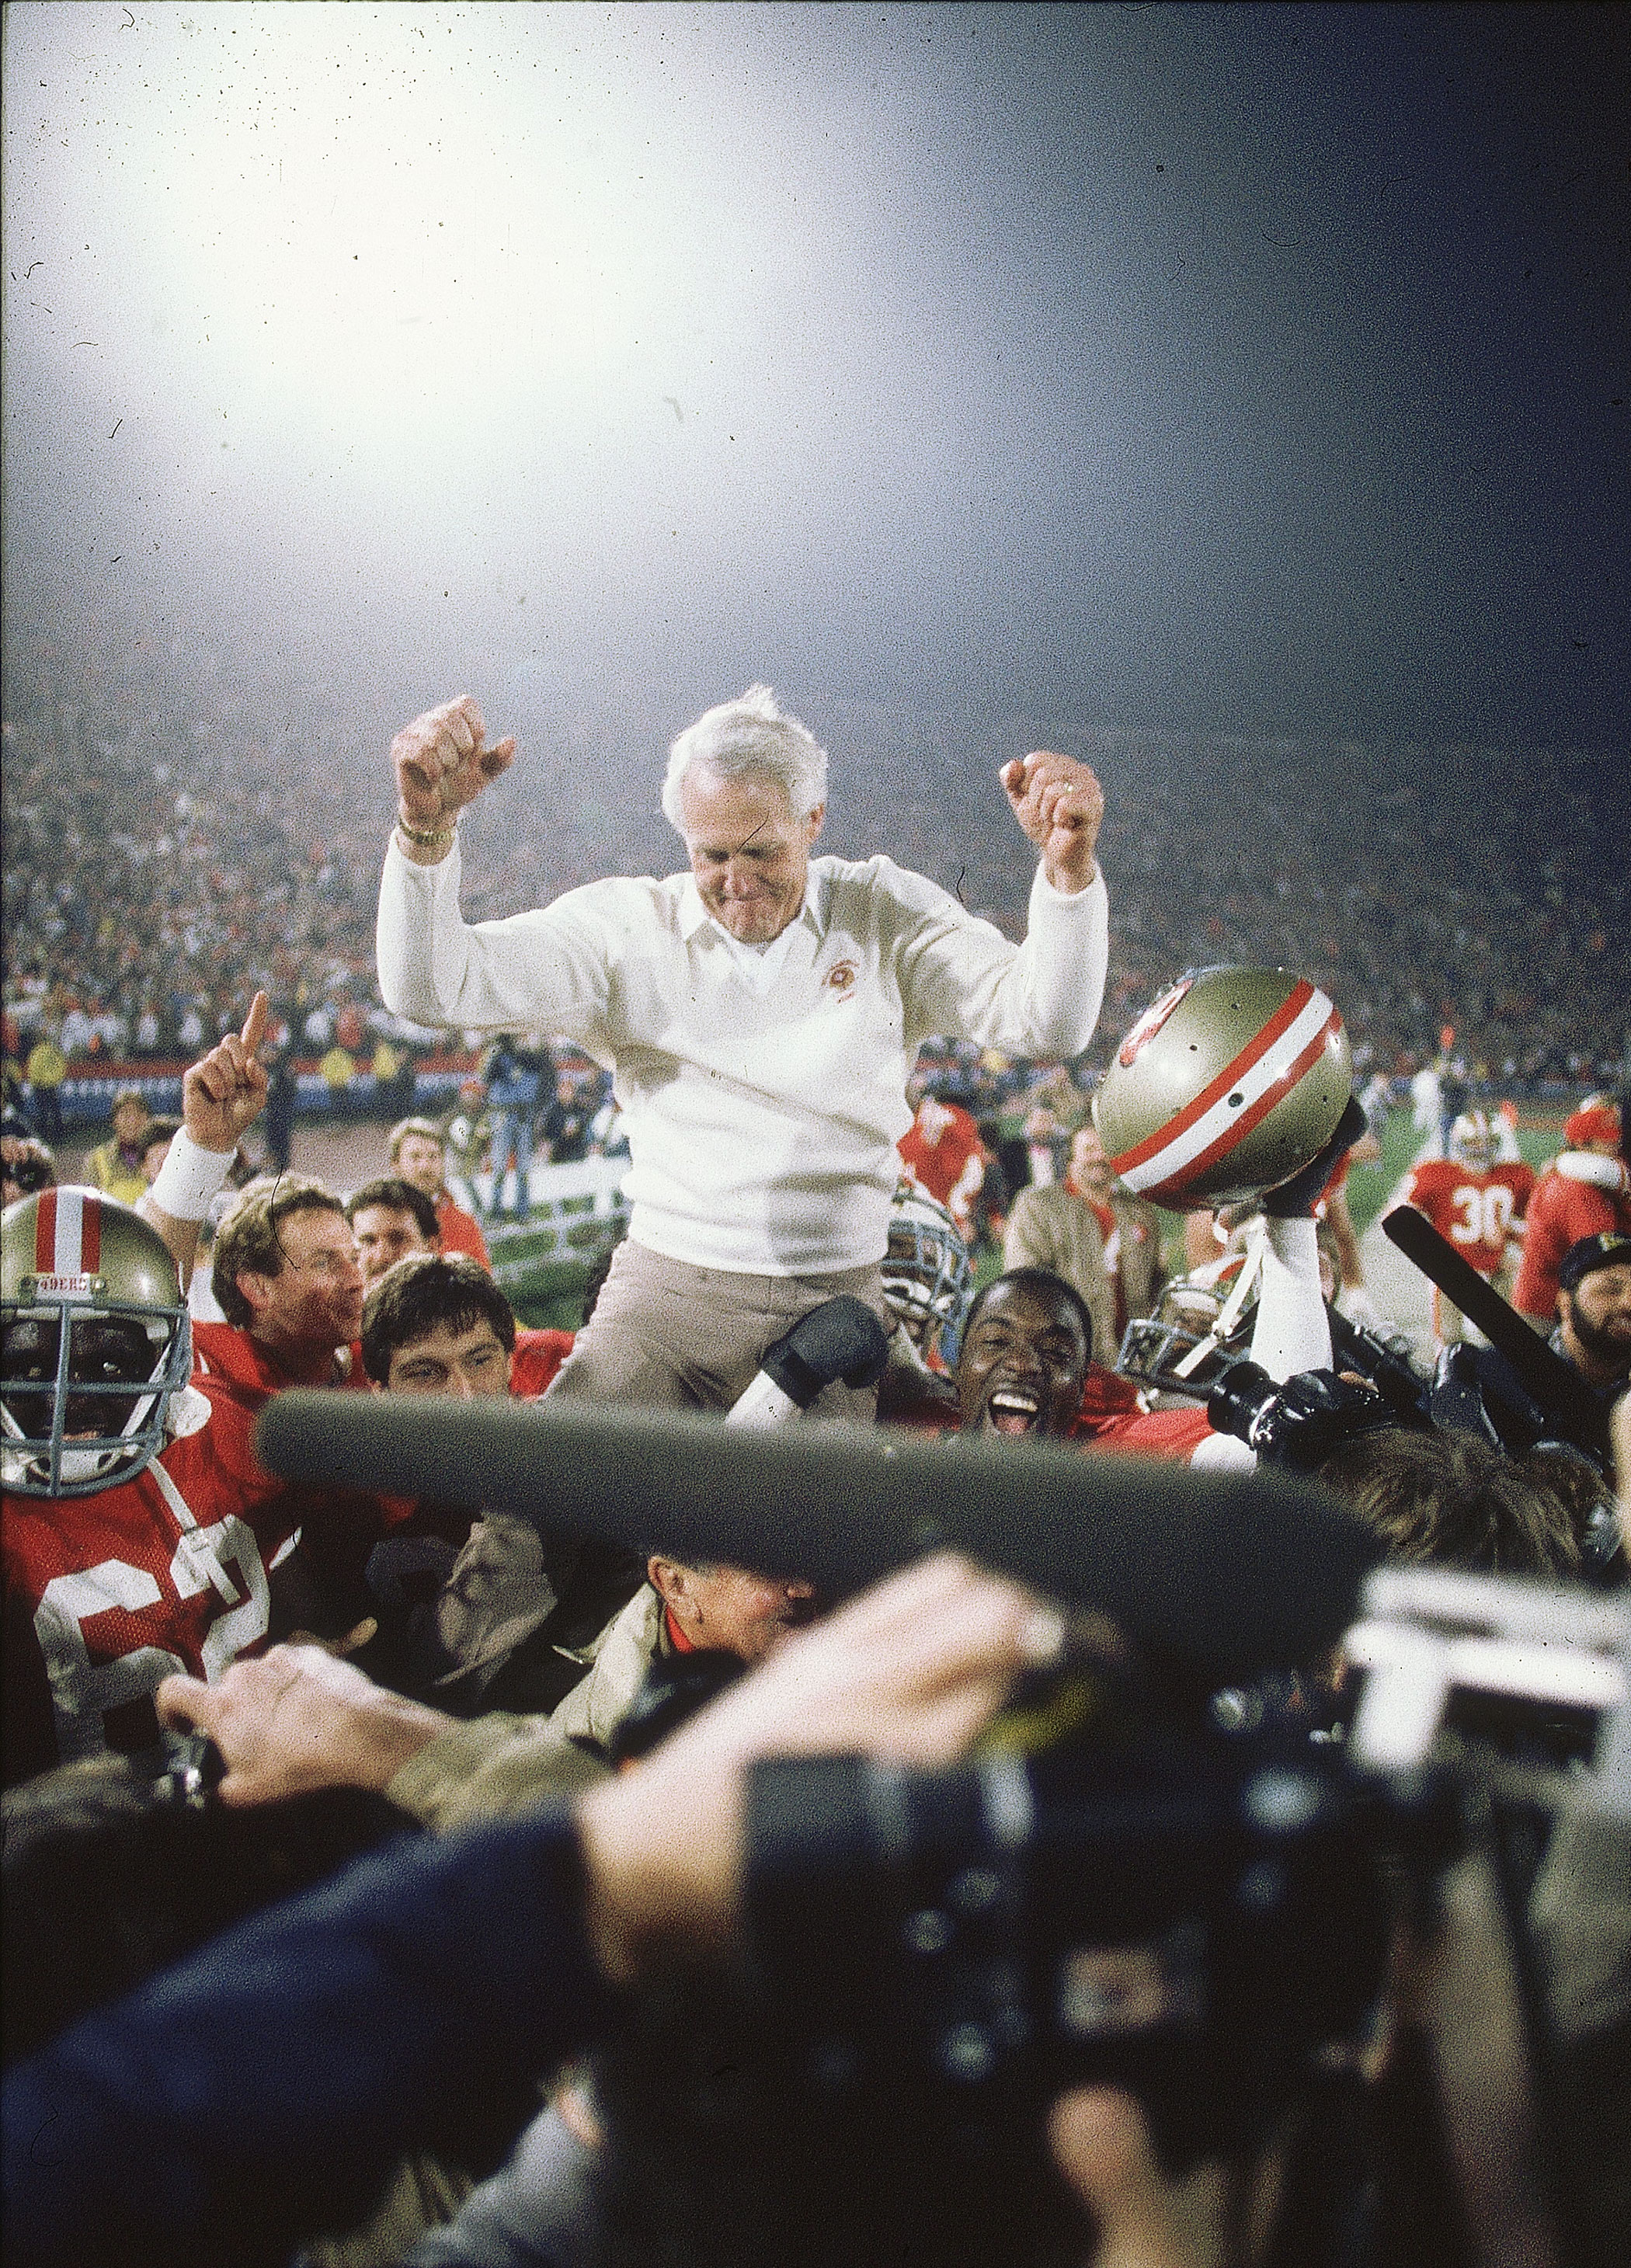 Super Bowl XIX, Jan. 20, 1985                               San Francisco 49ers vs Miami Dolphins in Stanford, Calif.